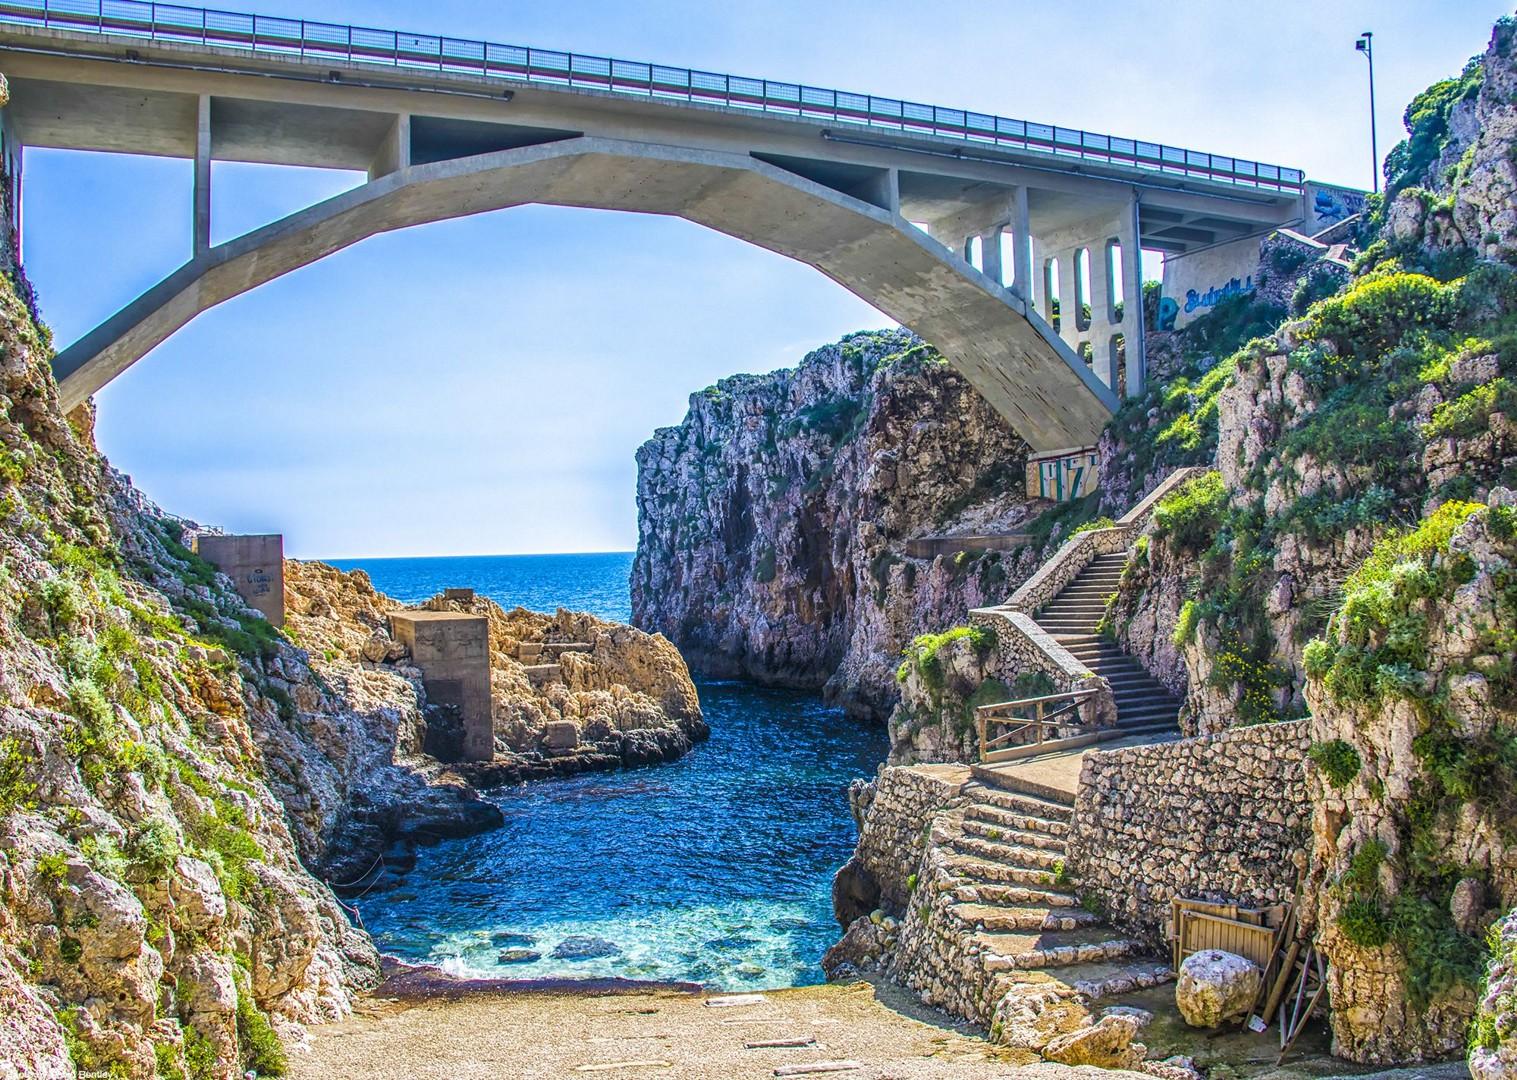 Puglia_0080-2.jpg - Italy - Puglia - Self-Guided Leisure Cycling Holiday - Leisure Cycling